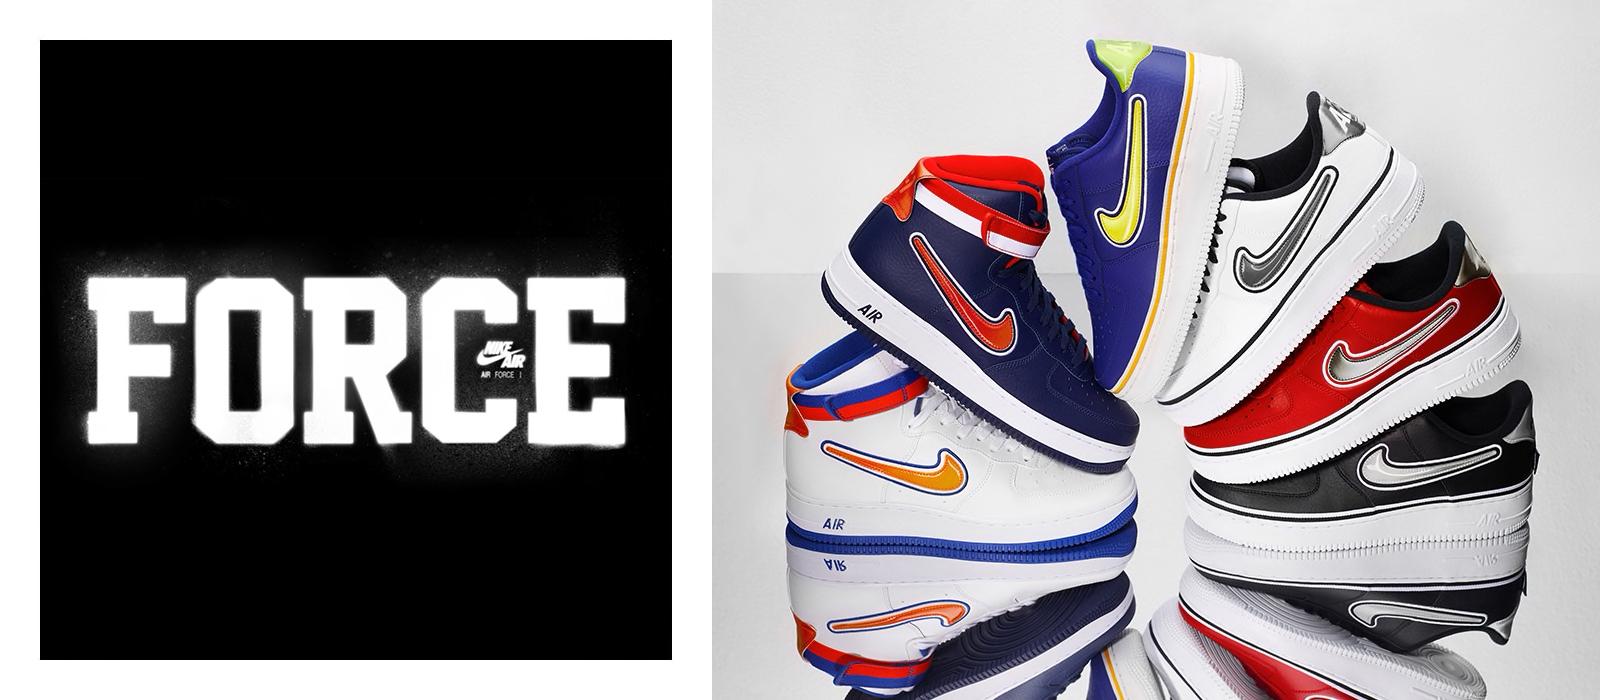 nba-nike-air-force-1-sneakers